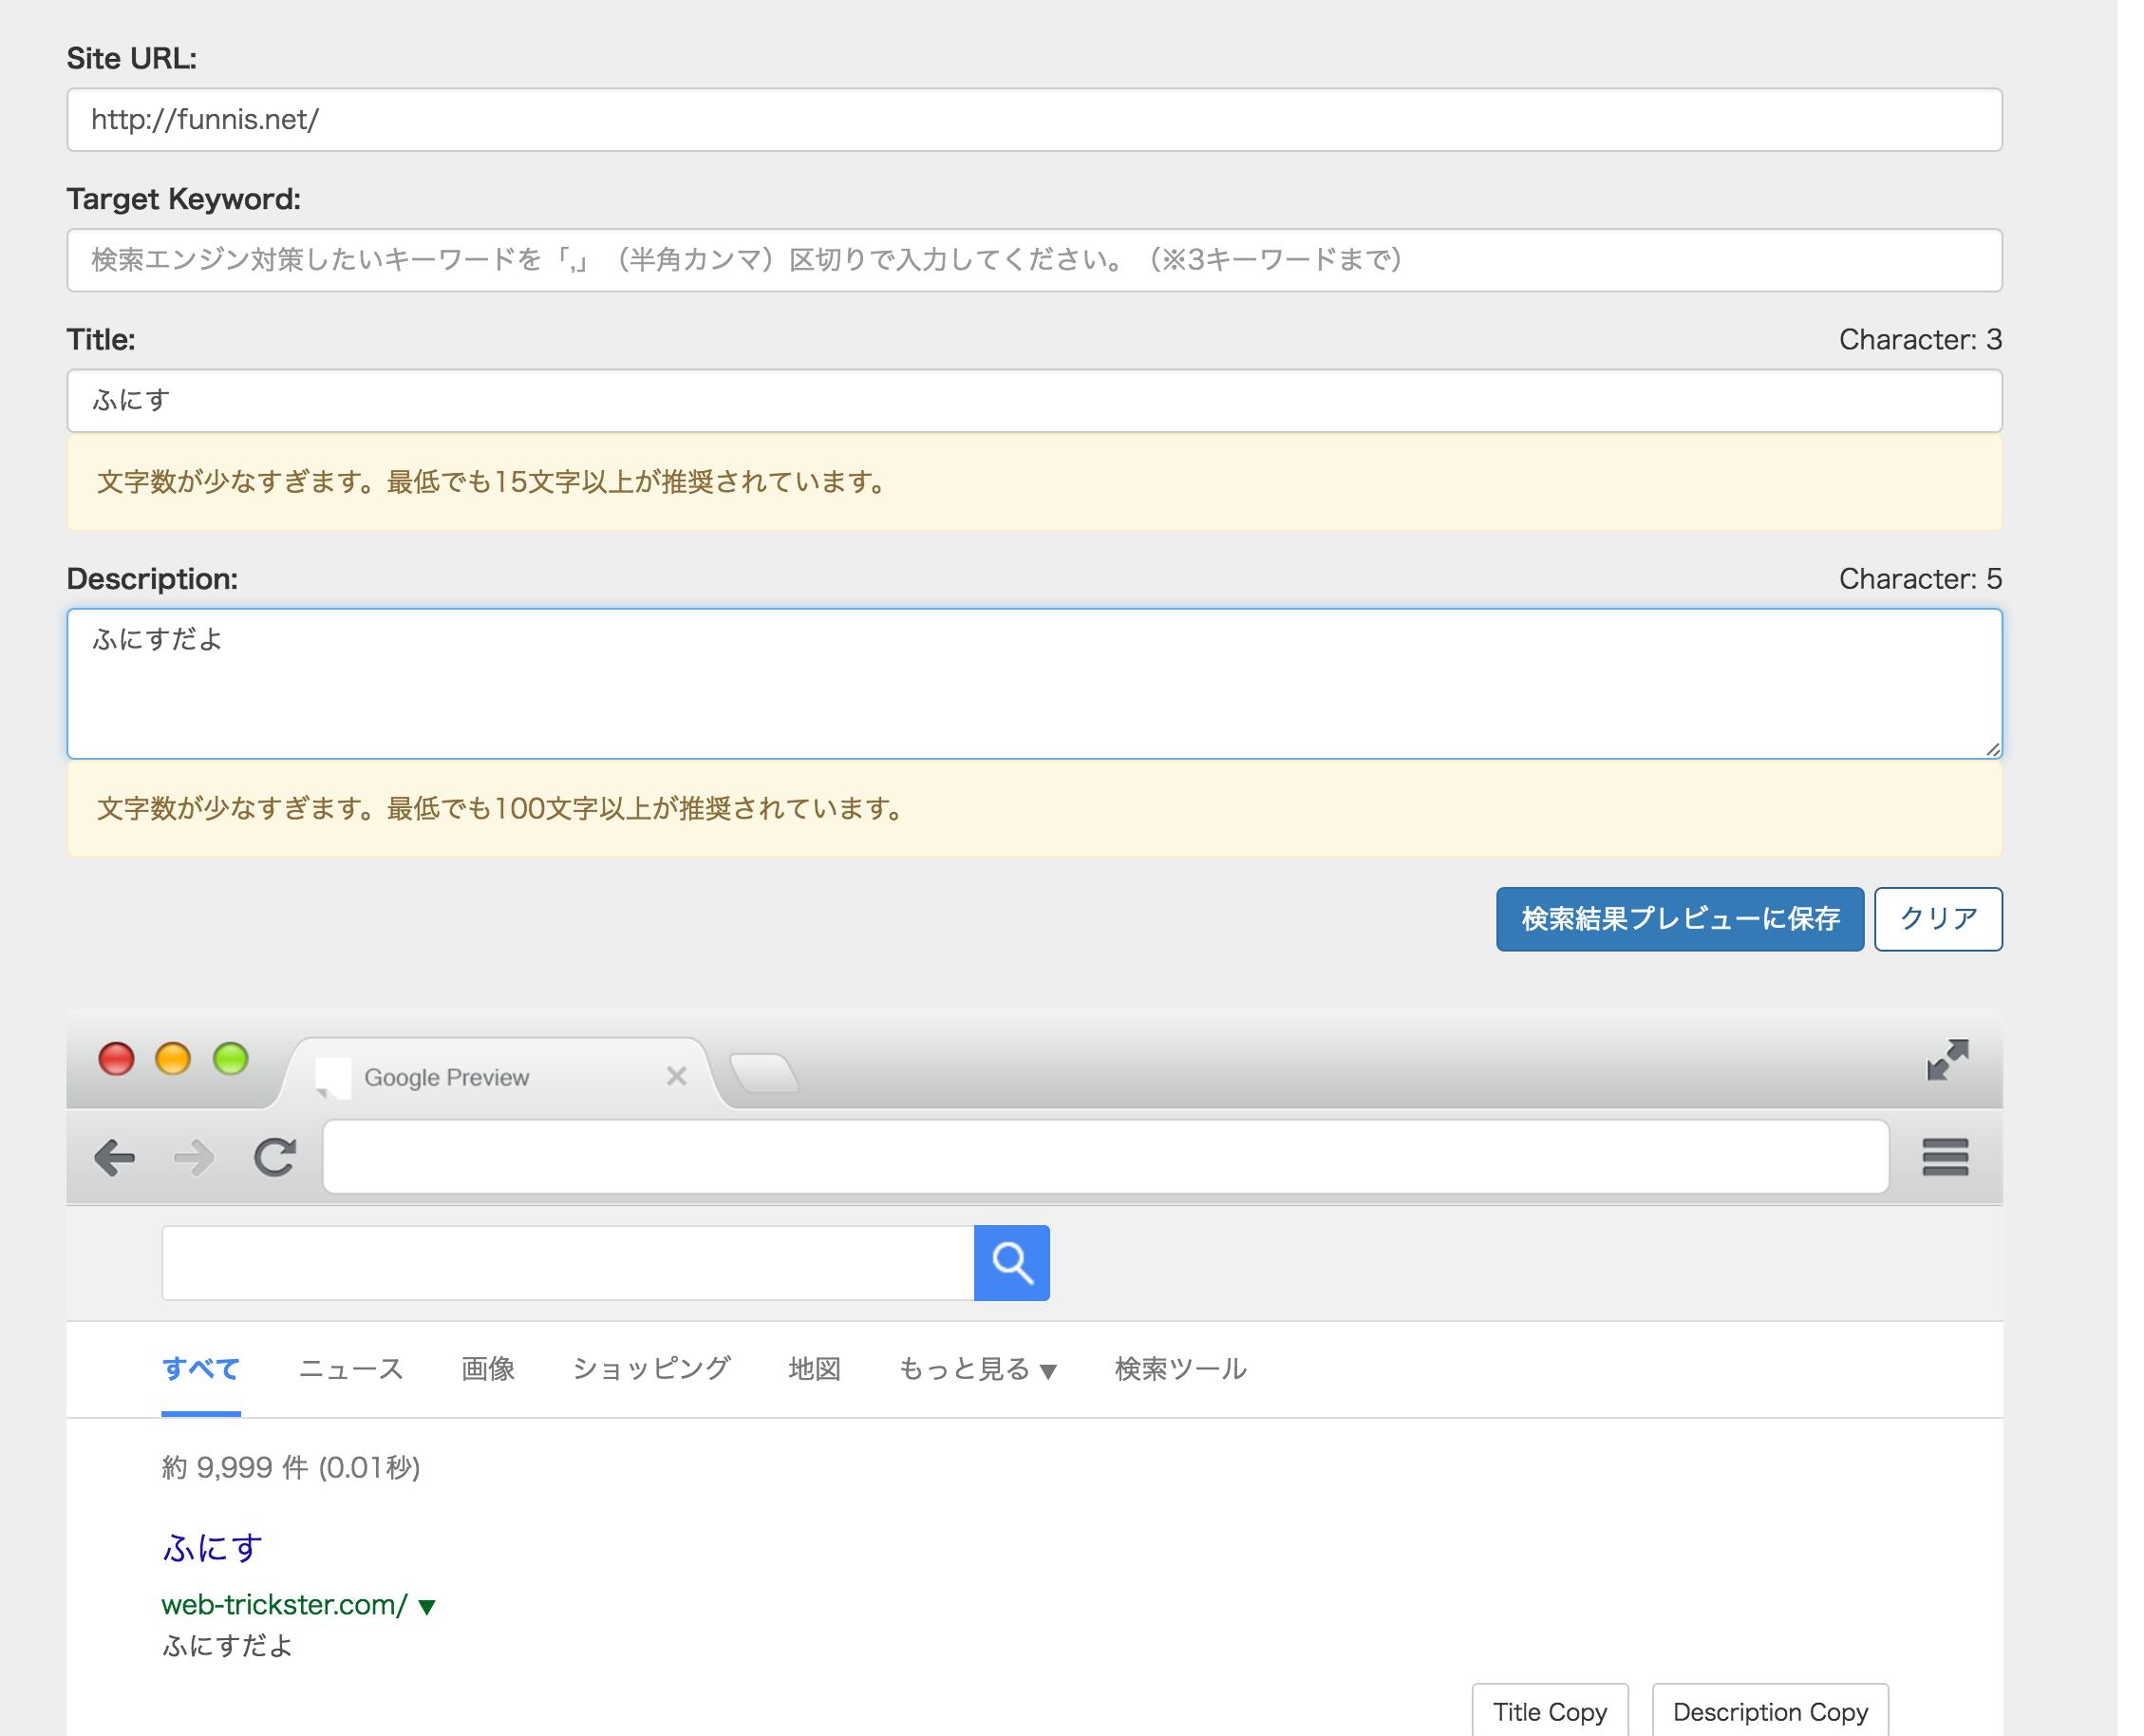 Google検索結果シミュレーターの画面